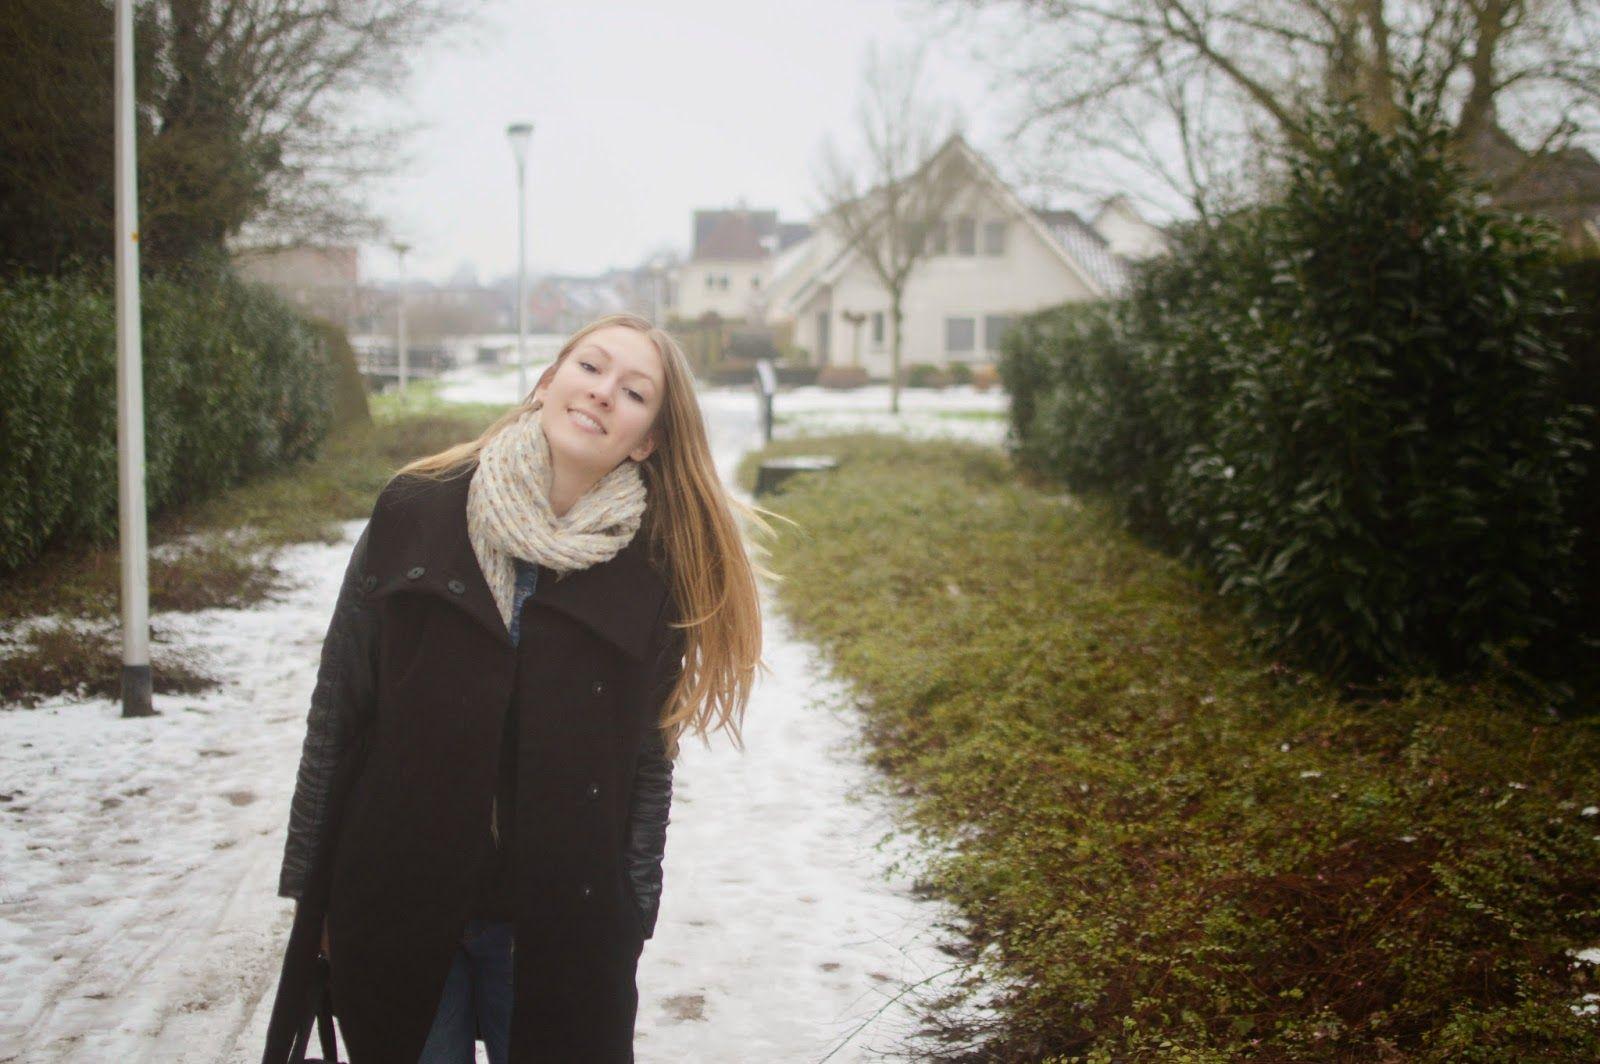 Wintery snaps